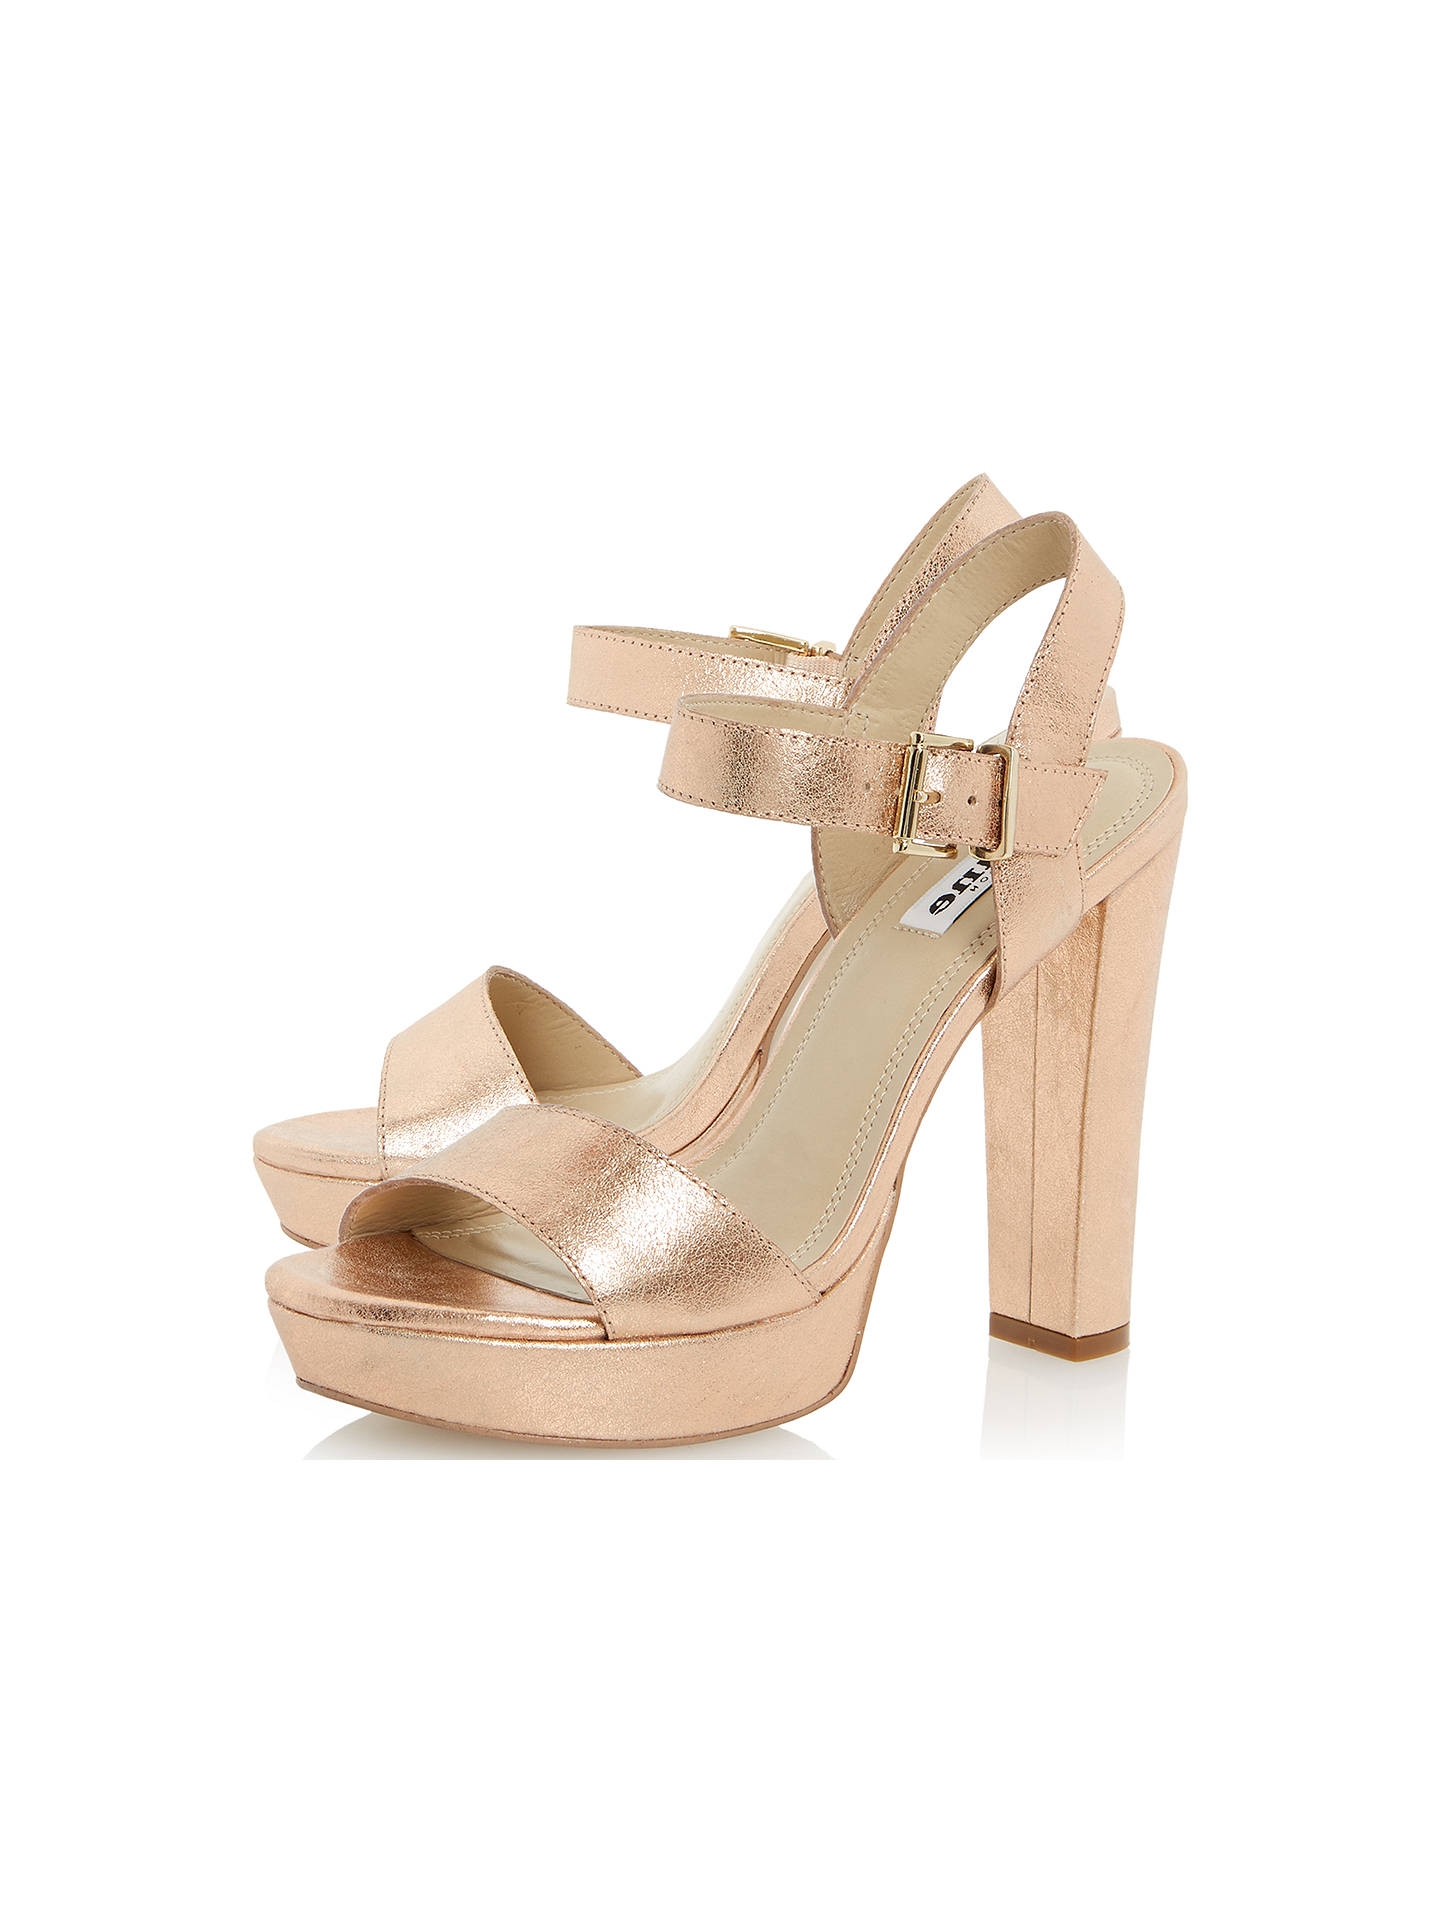 b1f22686f4a Buy Dune Mariella Block Heel Leather Sandals